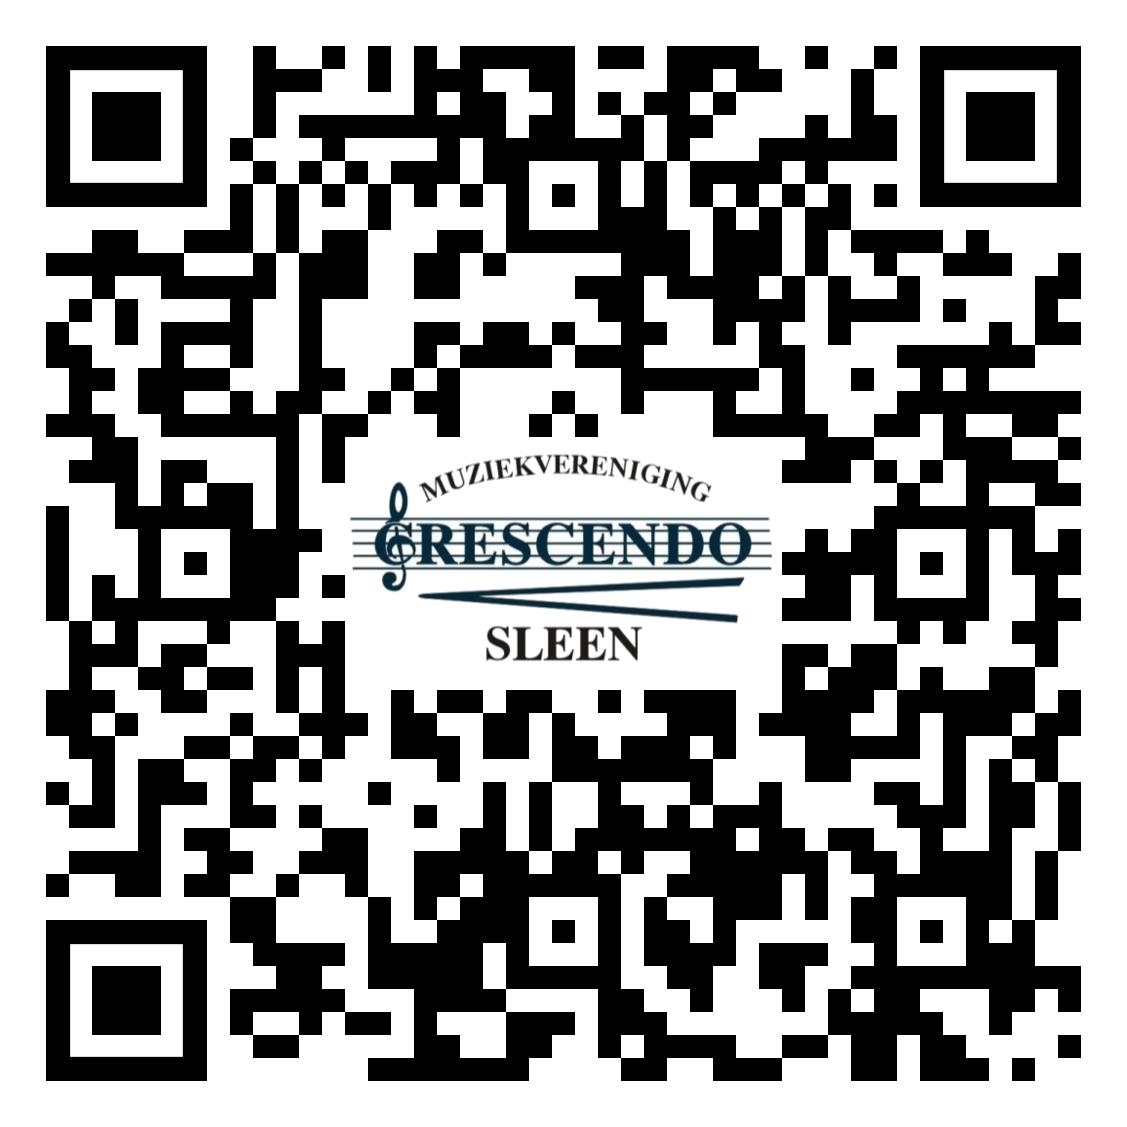 qr-code cultuurfond 2021